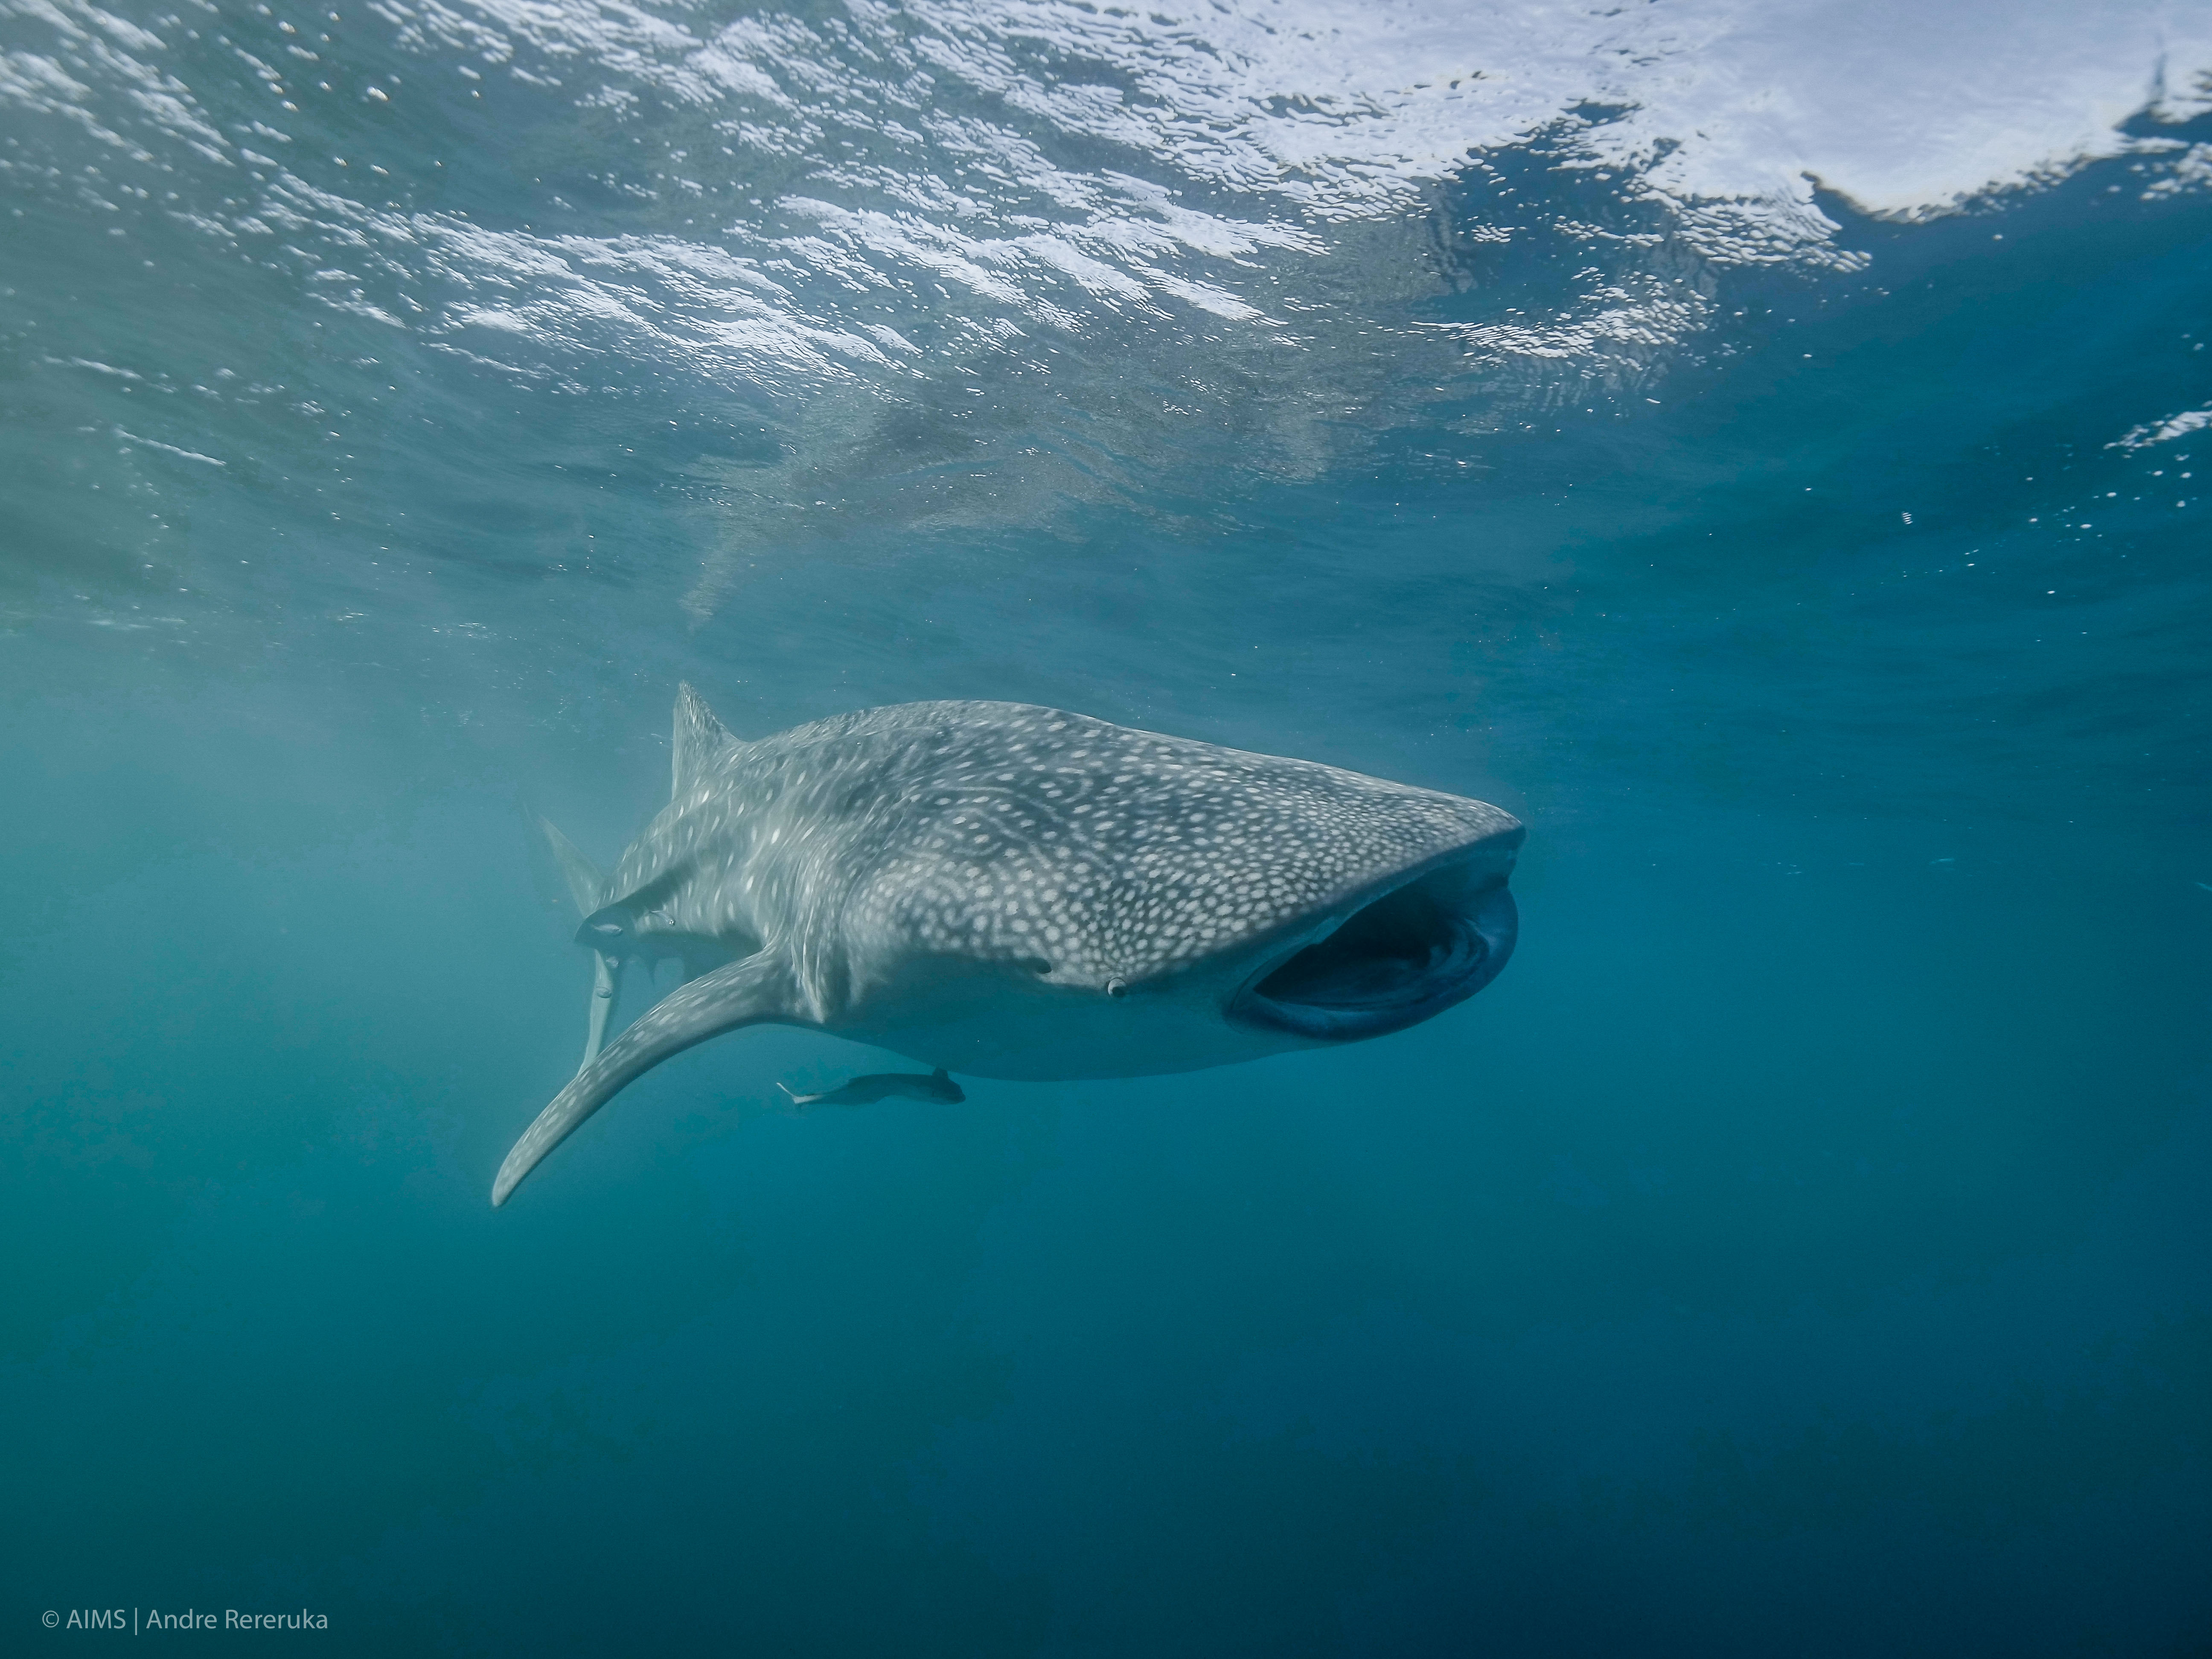 Andre Rerekura, Copyright AIMS / A whale shark at Ningaloo Reef, Western Australia